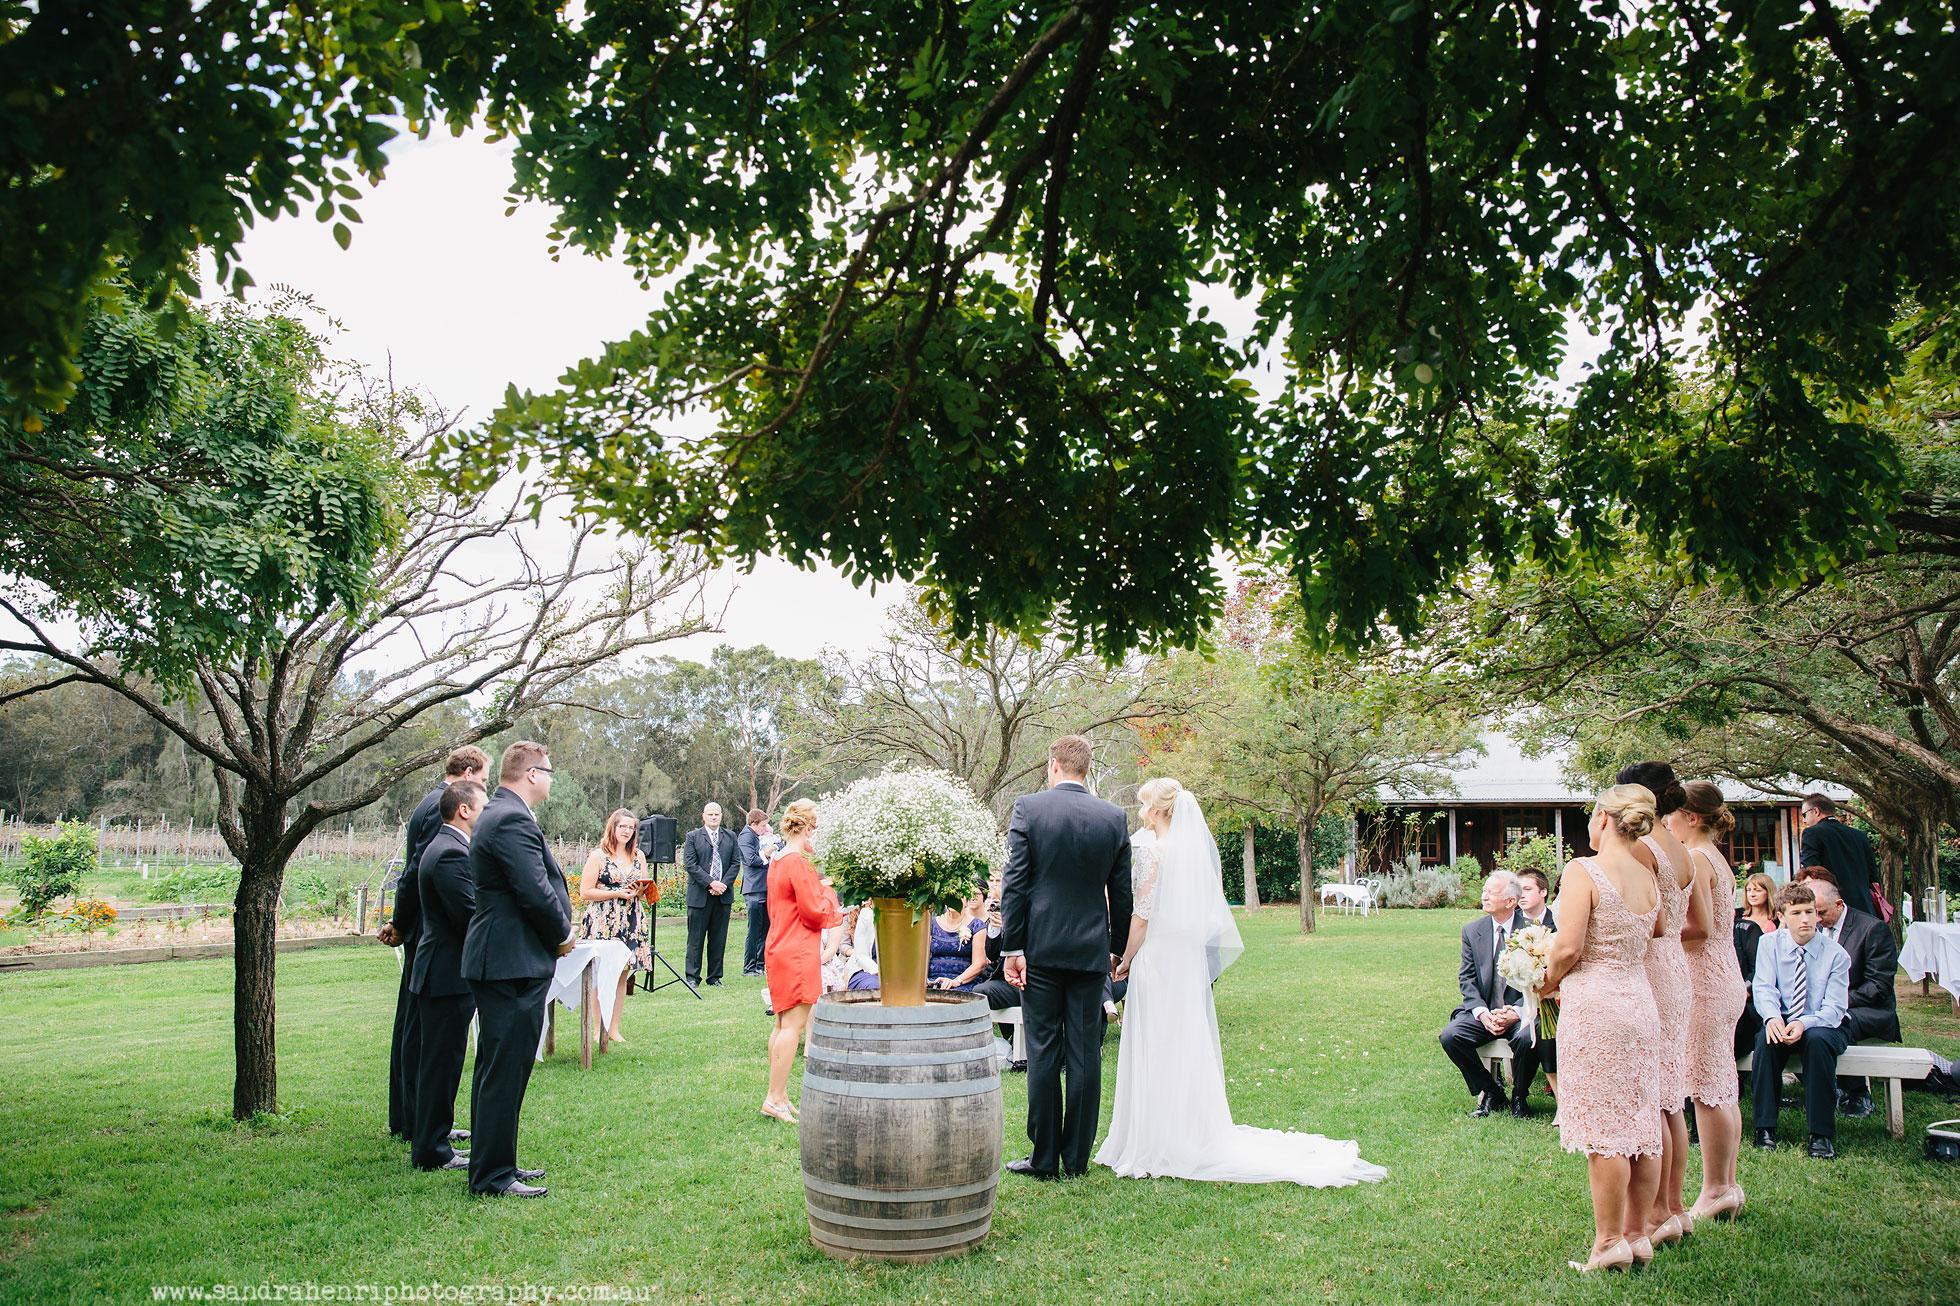 Roberts-Restaurant-garden-wedding-images-15.jpg